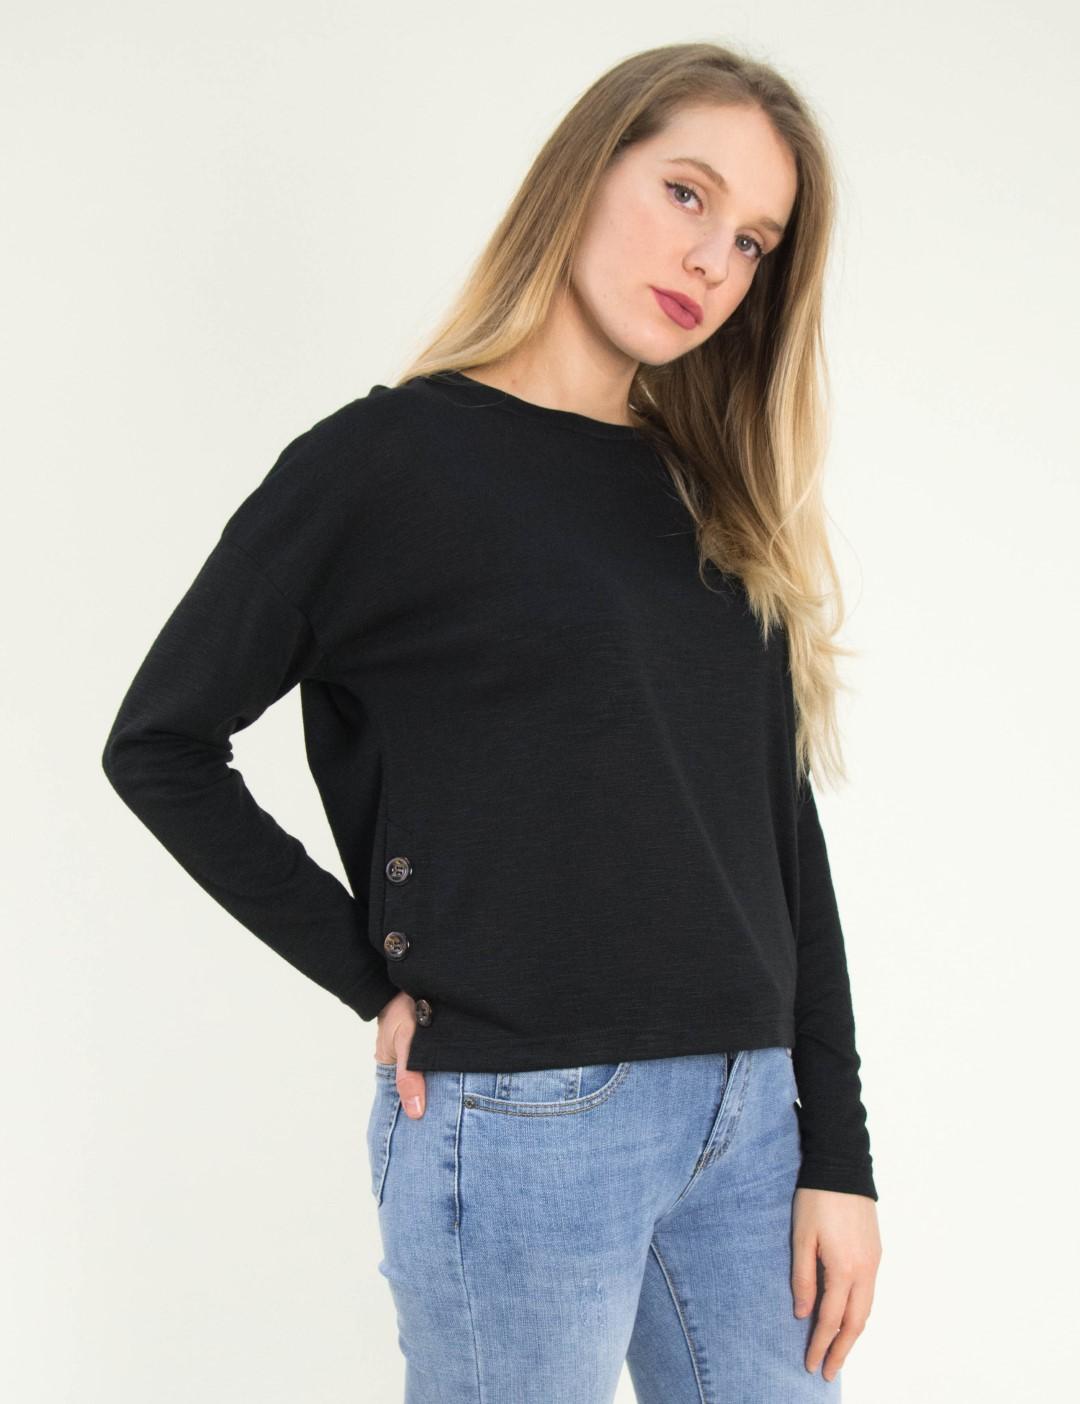 35ba022b45e6 Γυναικεία μαύρη μακρυμάνικη μπλούζα κουμπιά Cocktail 014101034G